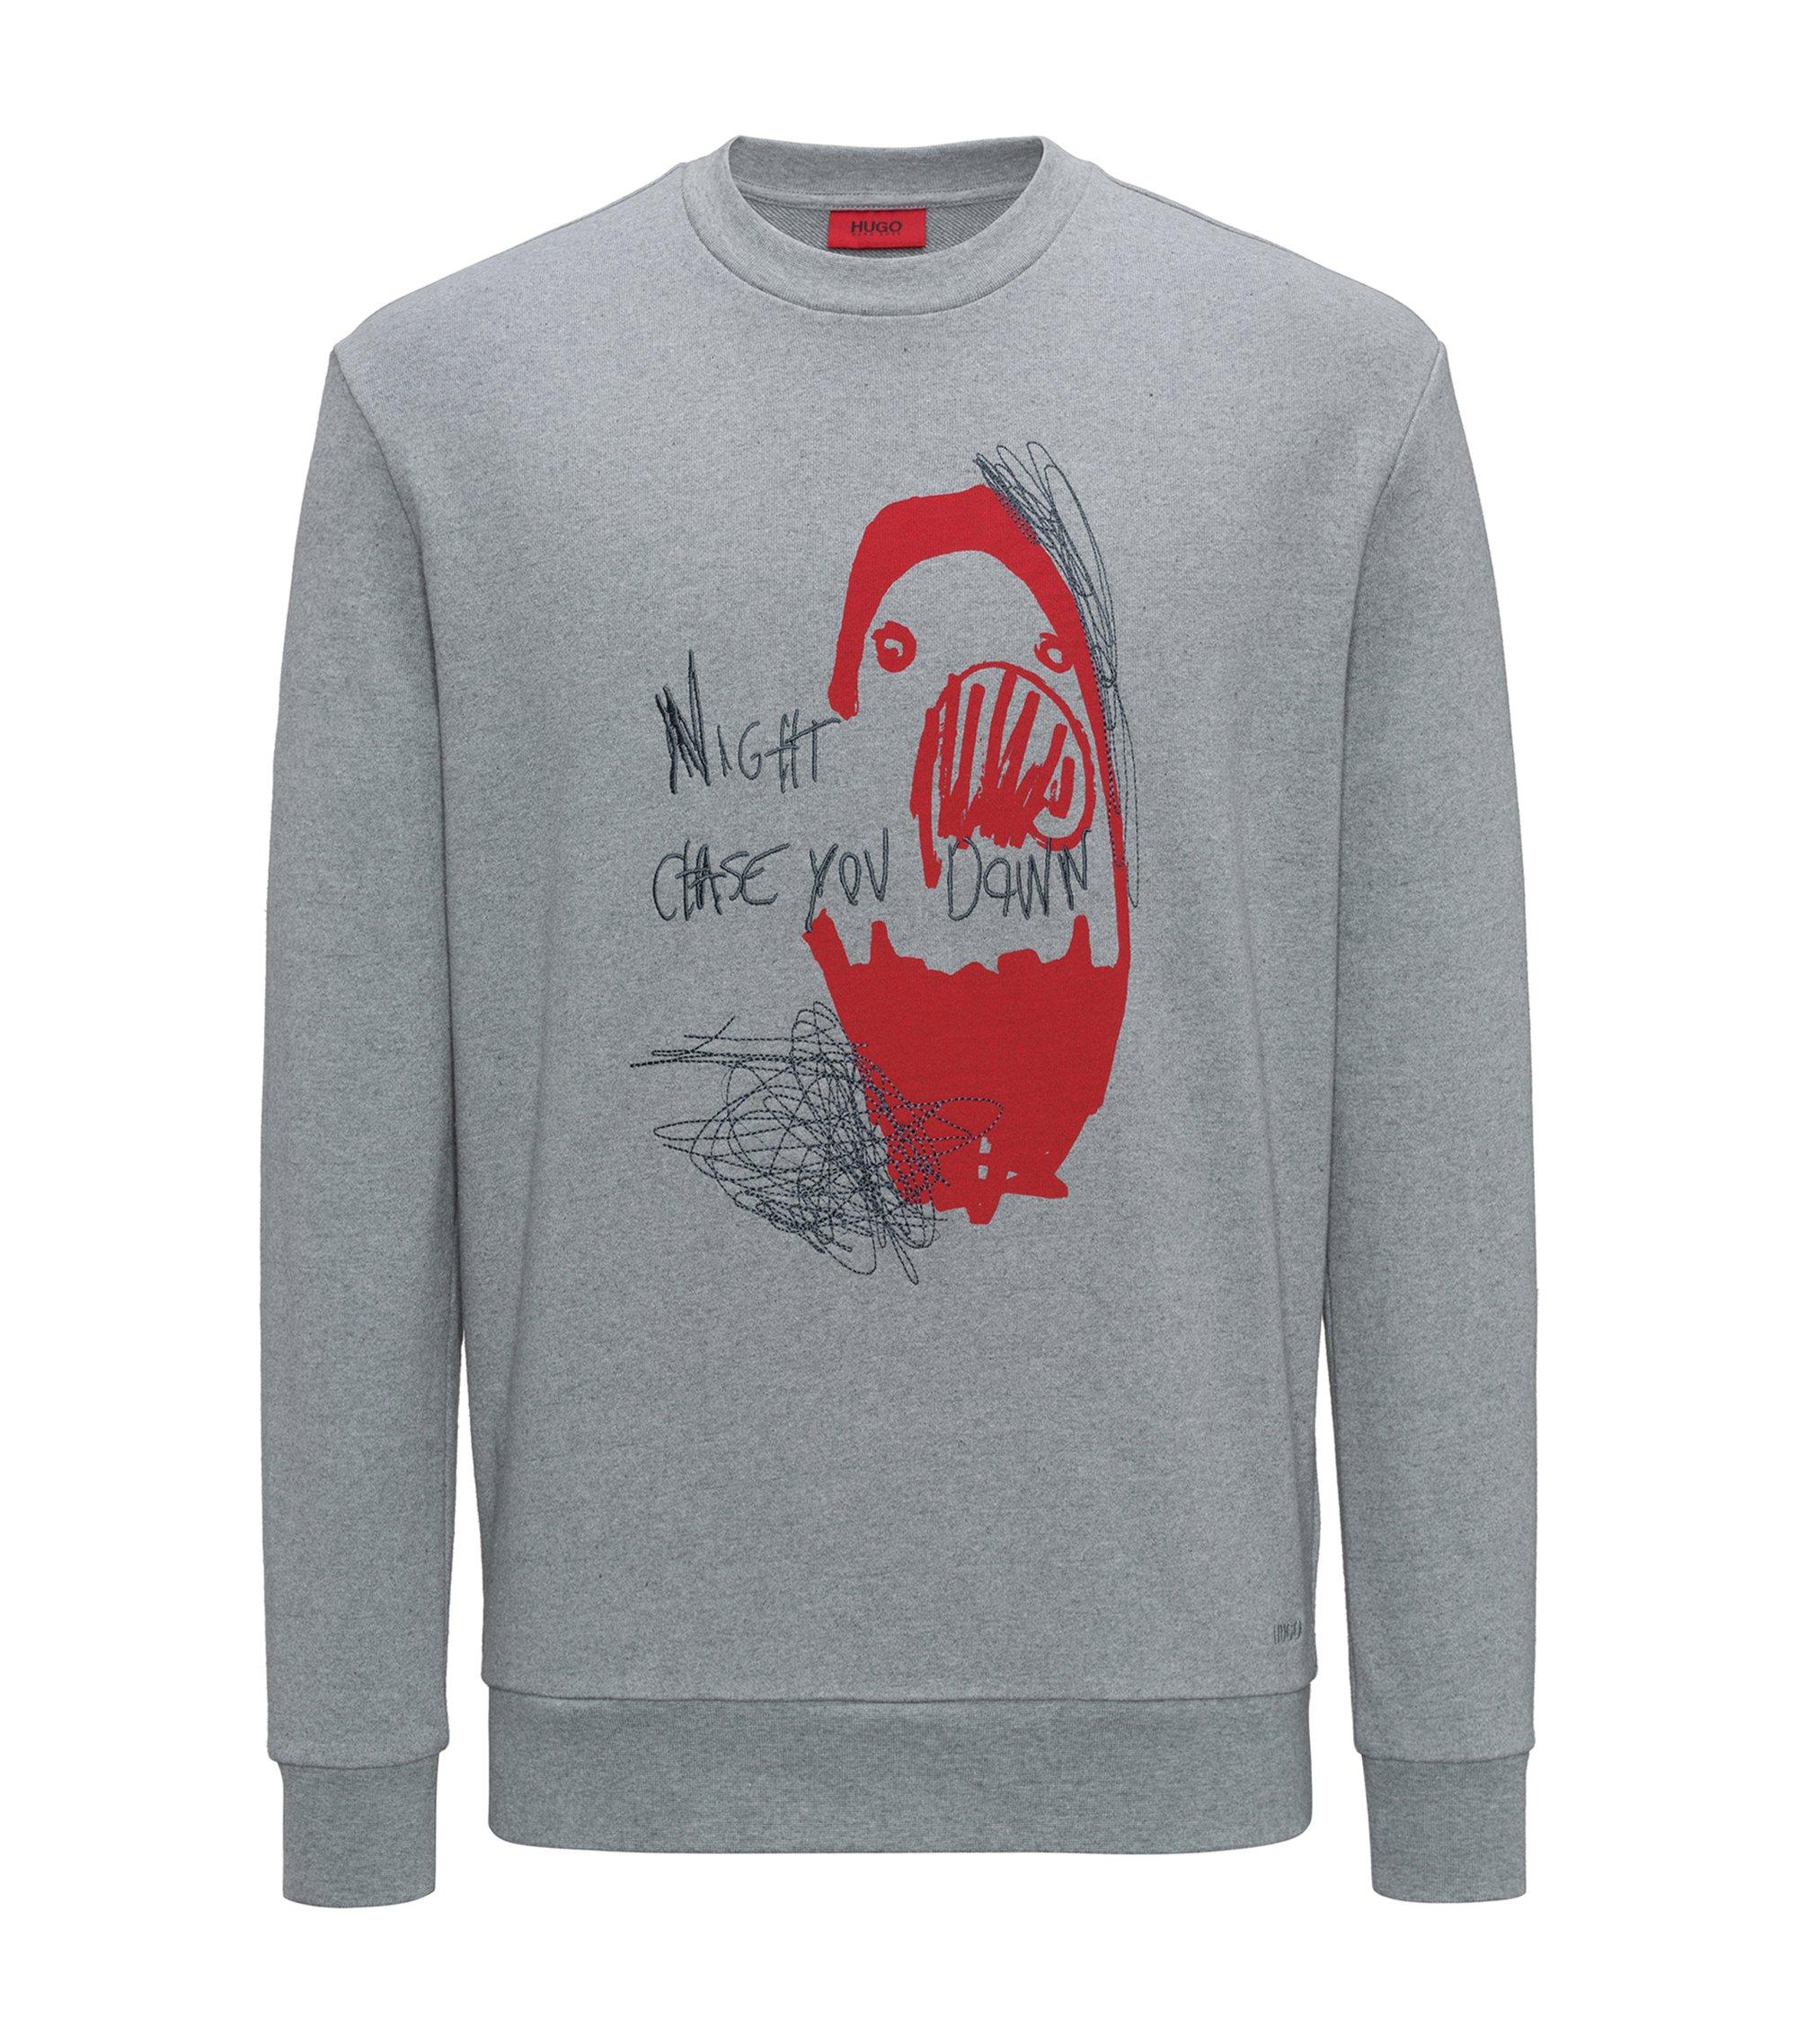 Cotton sweatshirt with slogan and artwork, Grey